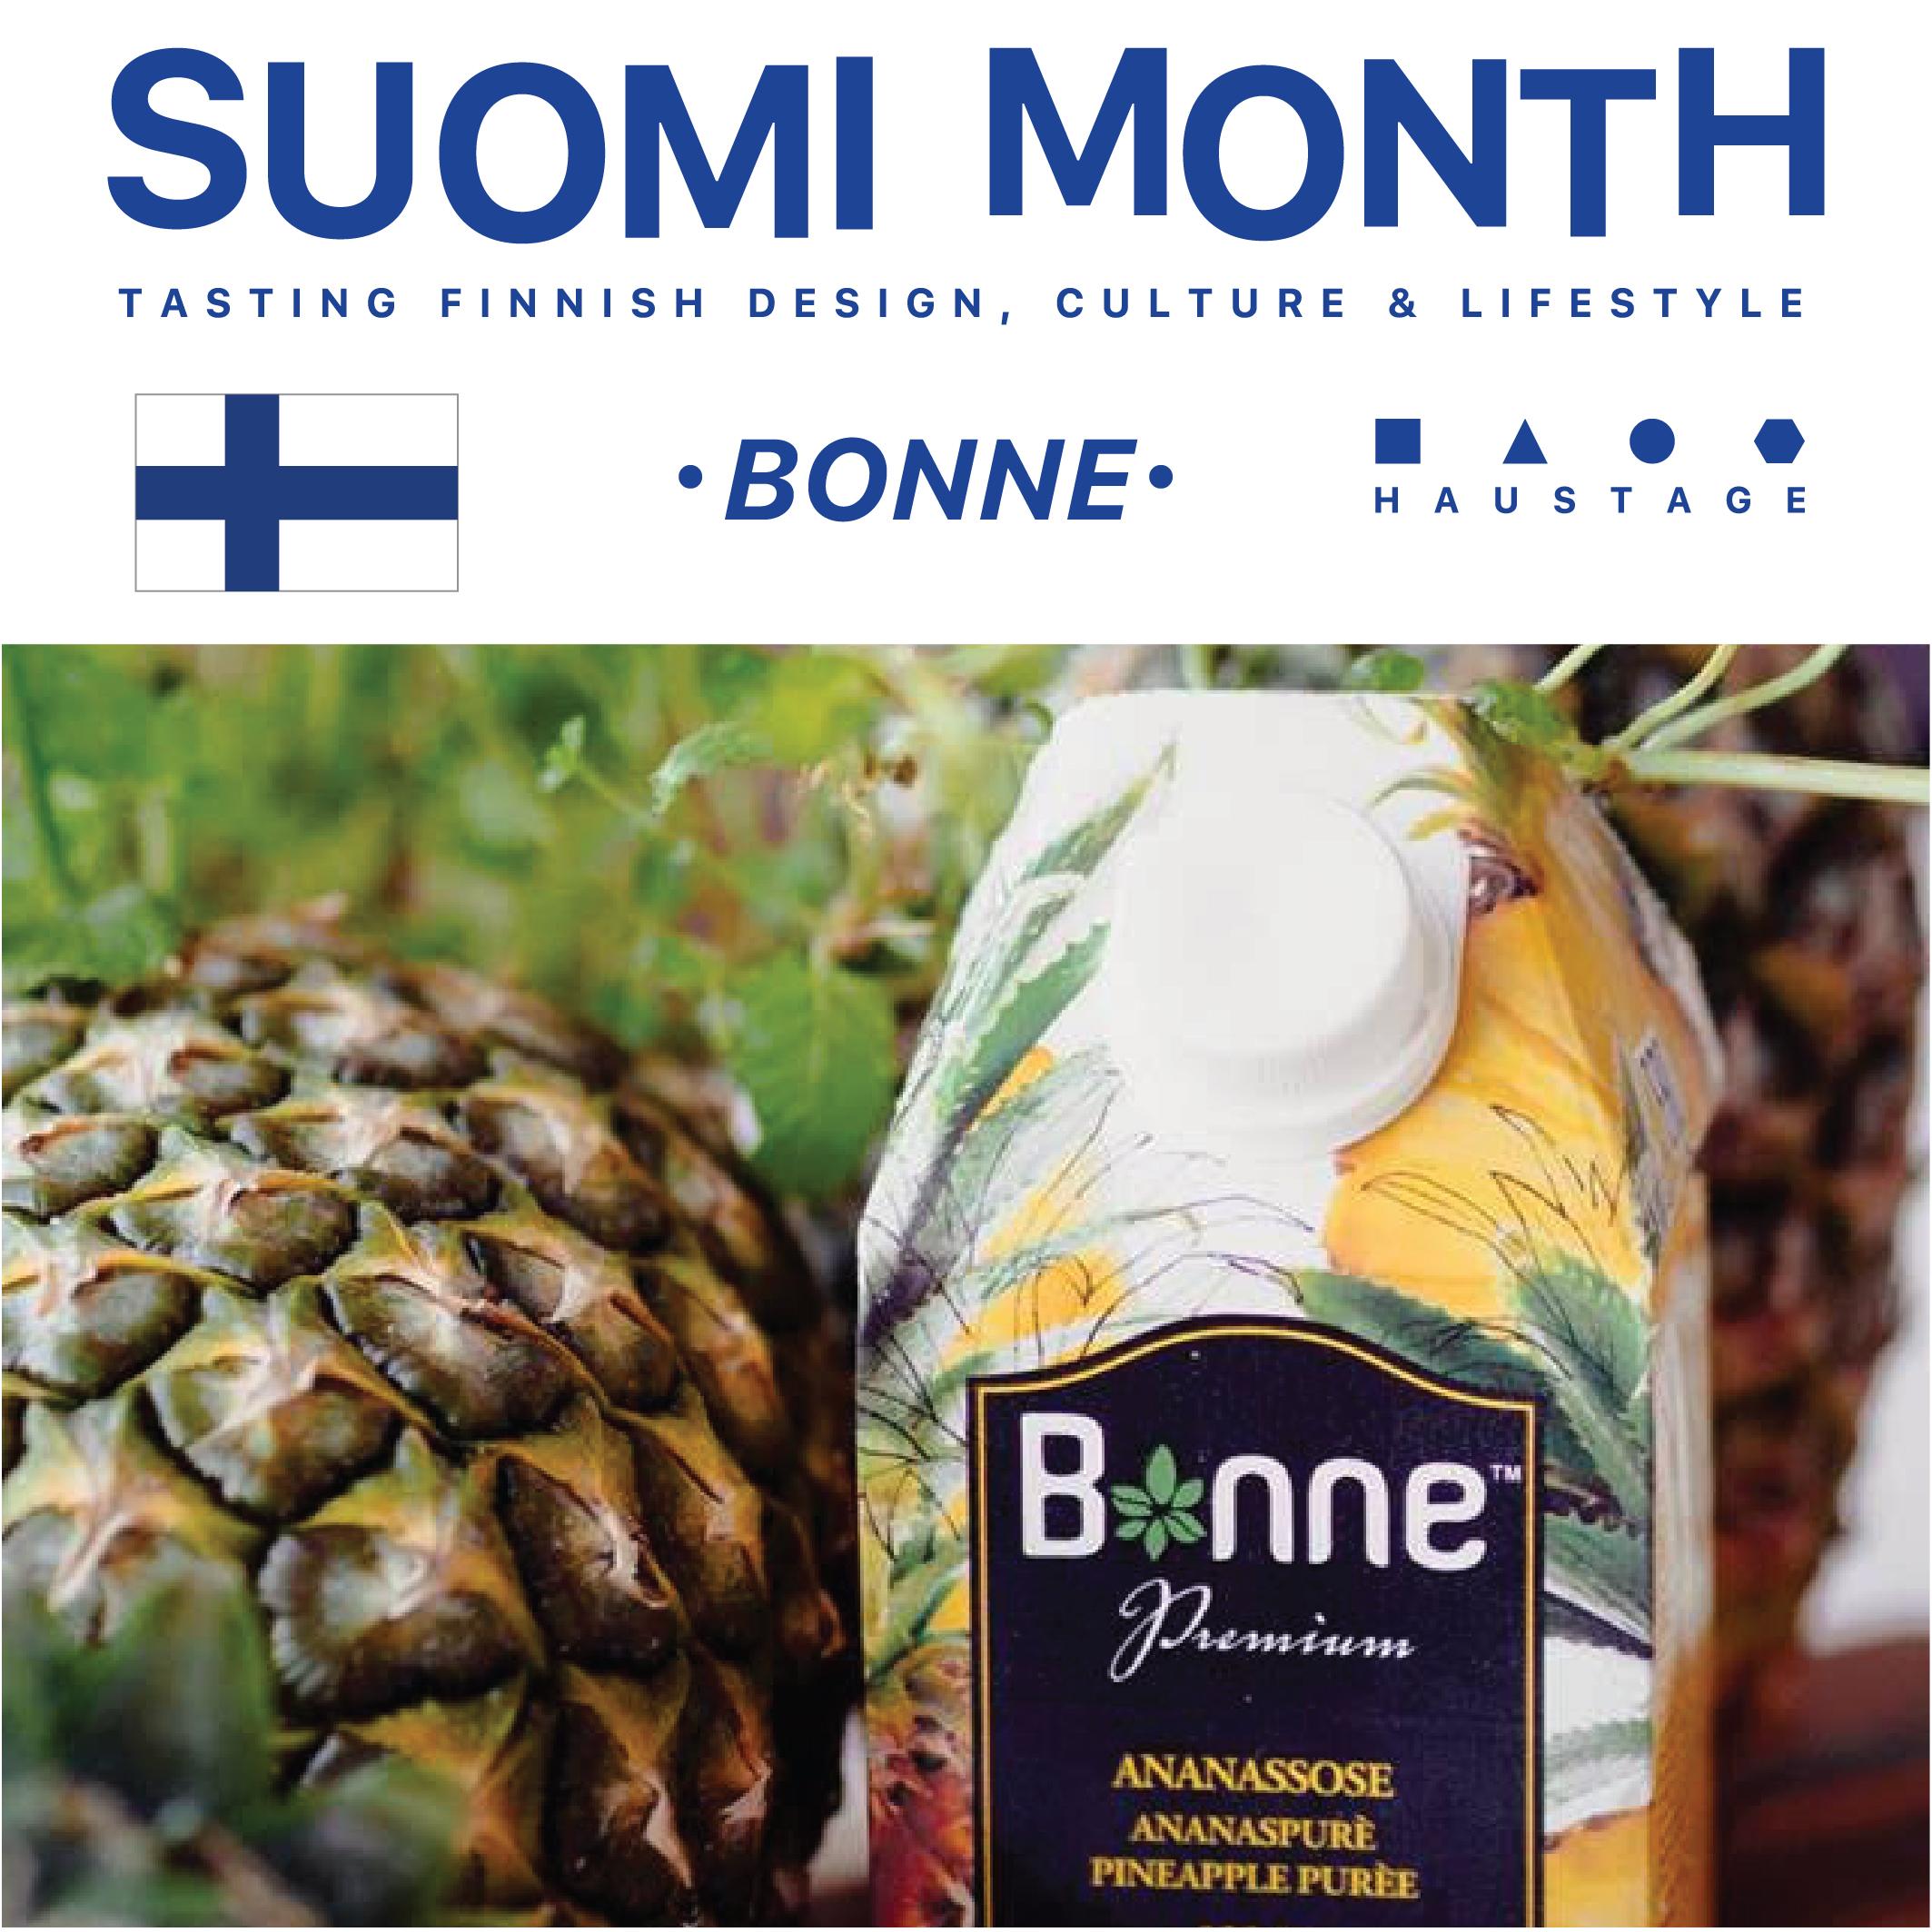 SUOMI IG posts-05